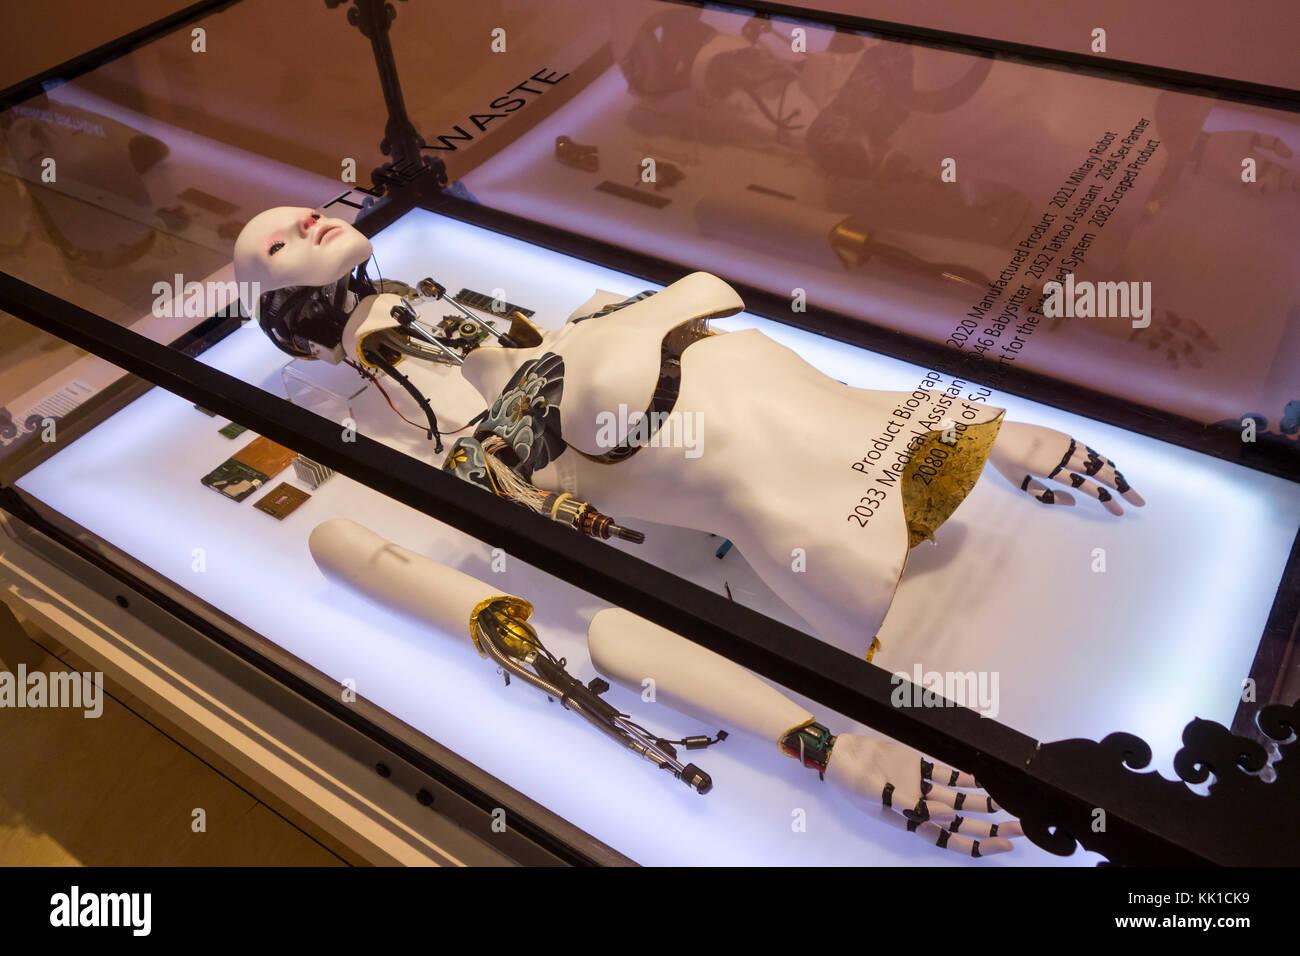 Installation The Waste, techno consumer culture where body parts are disposable - Stock Image